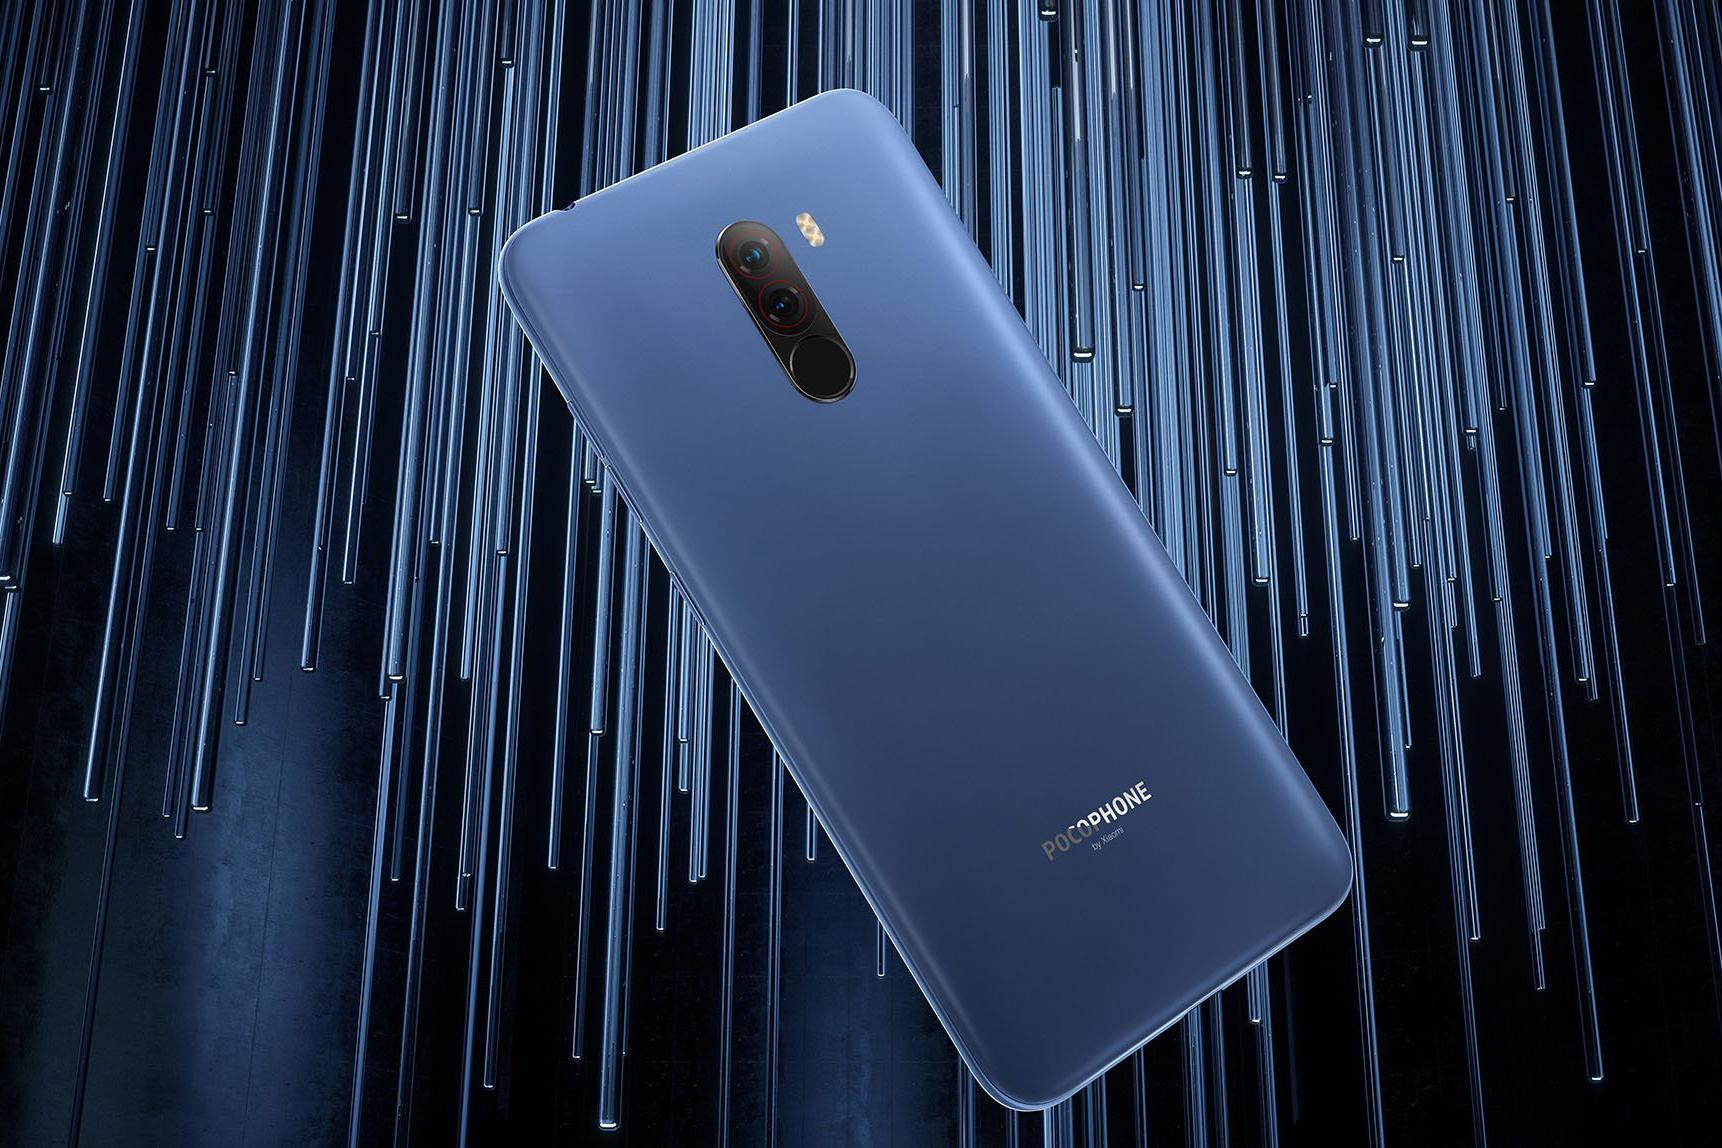 Pocophone F1 okostelefon 6+64GB, kék